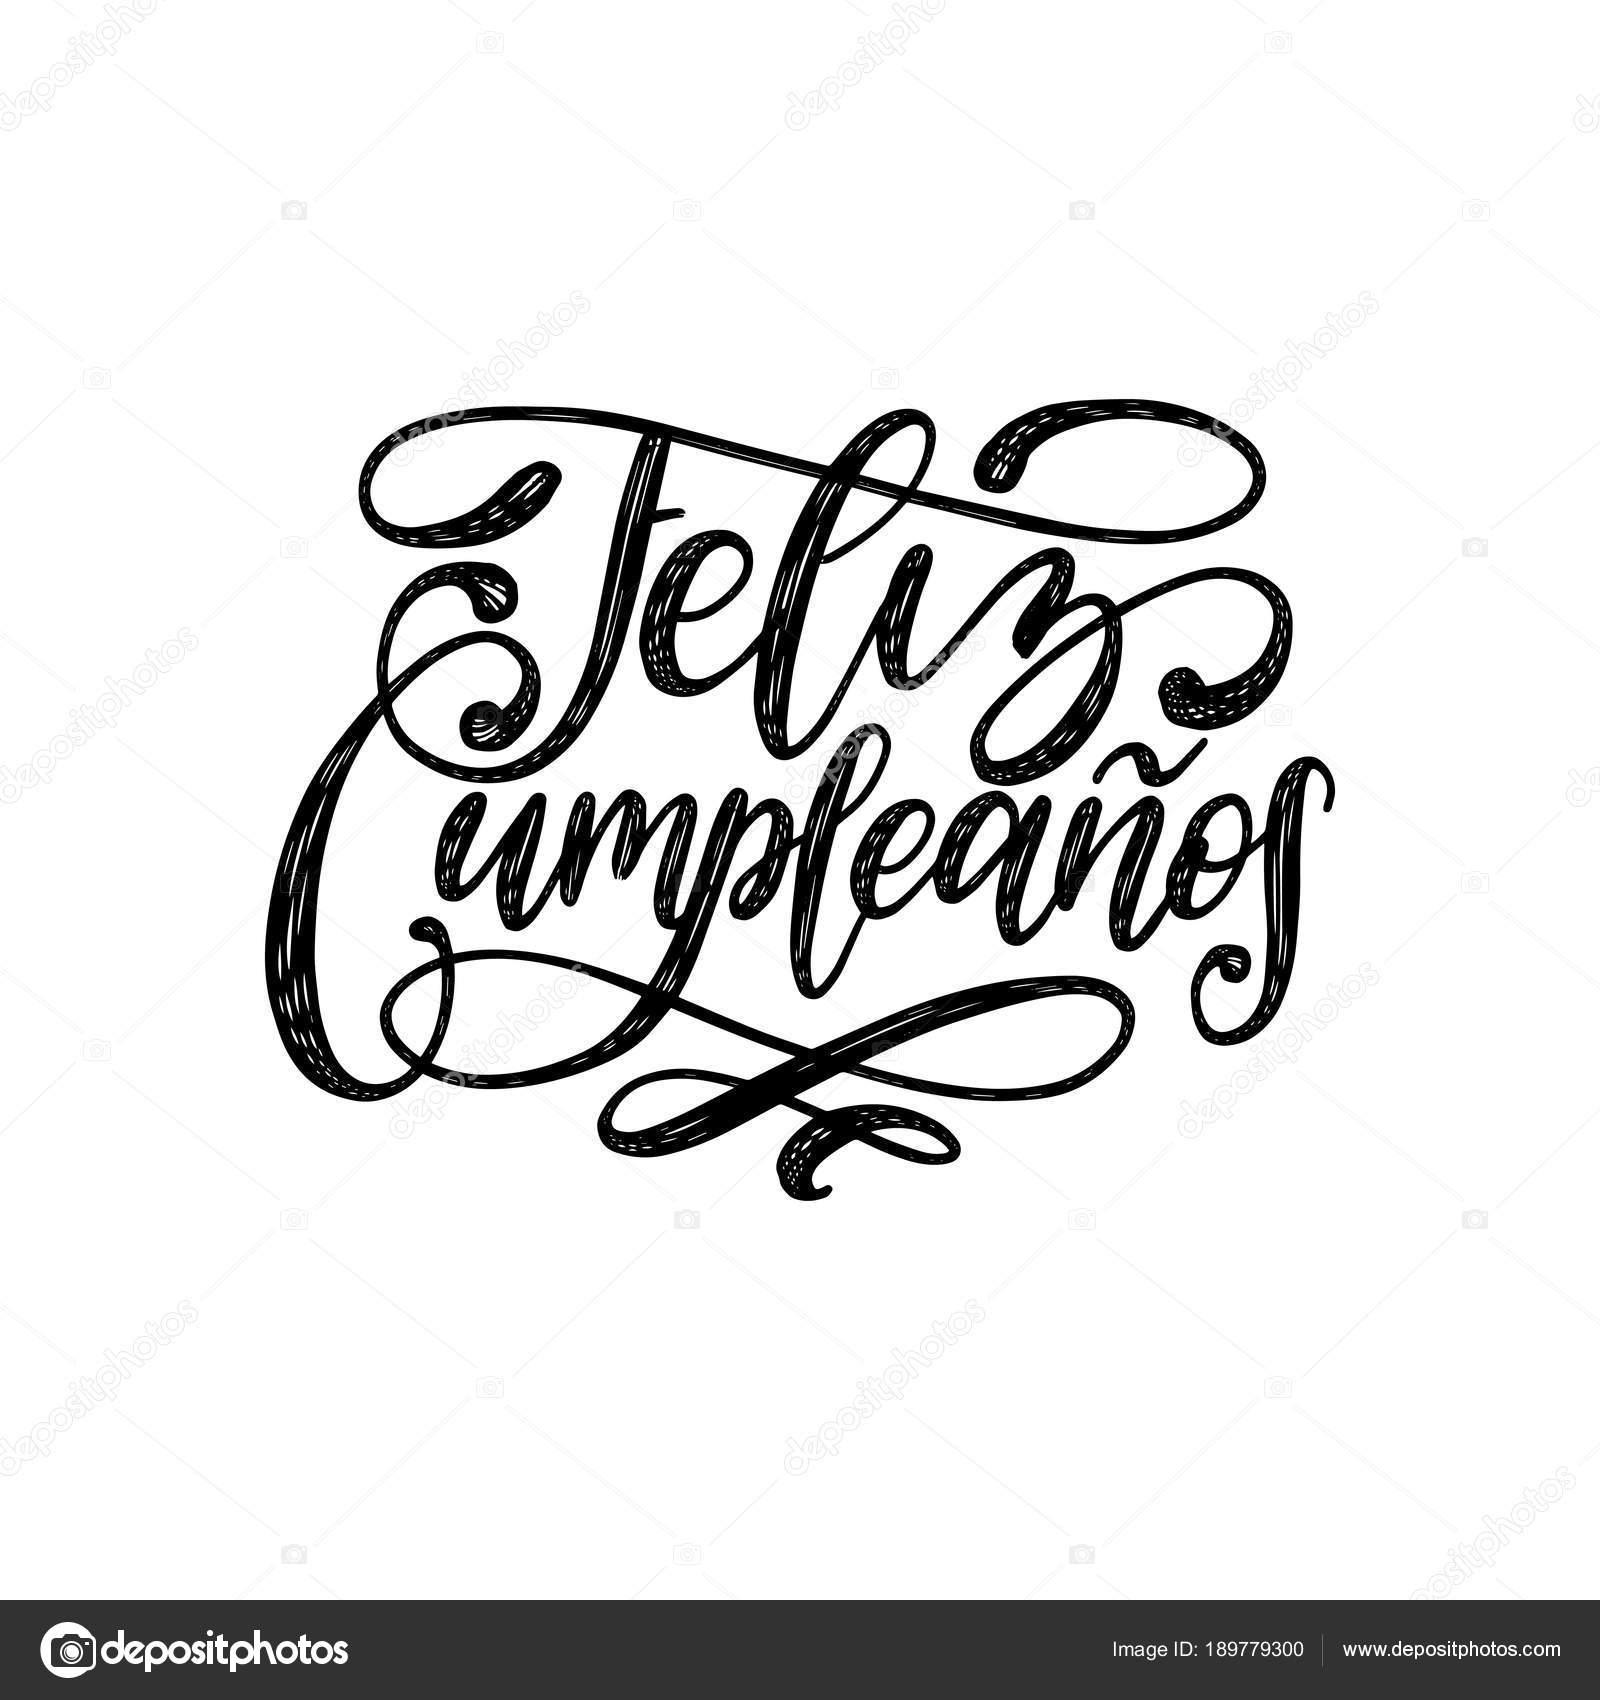 feliz cumpleanos traducido mano espa u00f1ol feliz cumplea u00f1os calligraphy vector font calligraphy vector free download